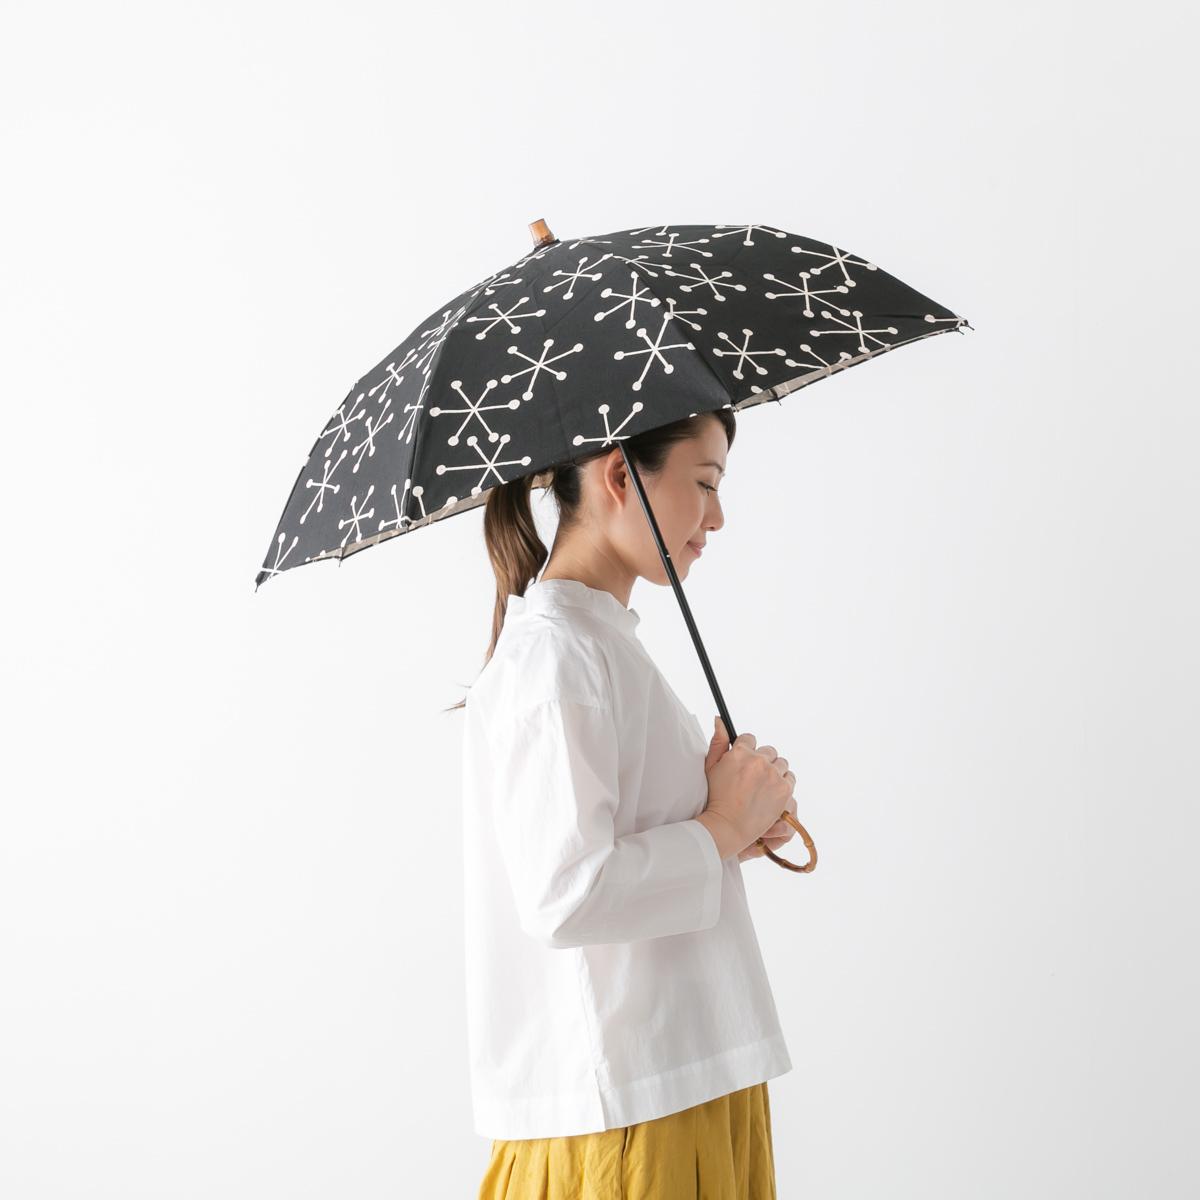 sur mer シュルメール コットンリネン 結晶柄 晴雨兼用 折り畳み傘 SO-010-BK